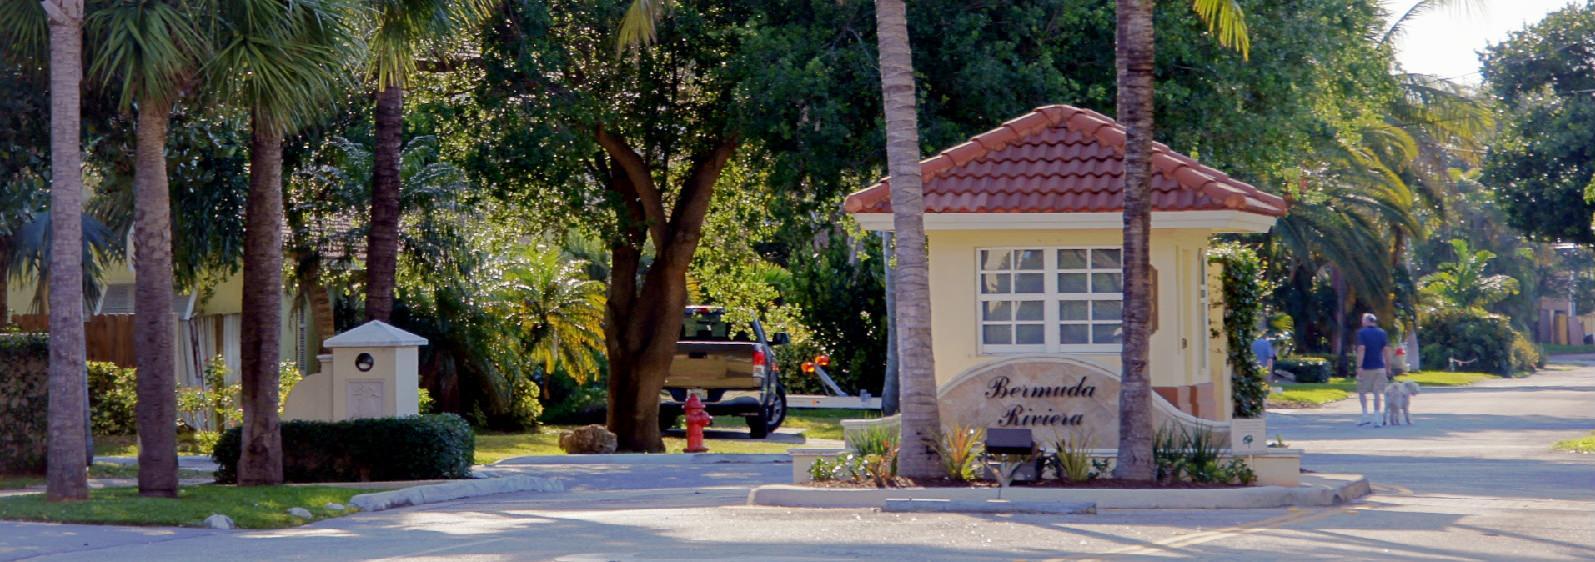 Bermuda Riviera Fort Lauderdale